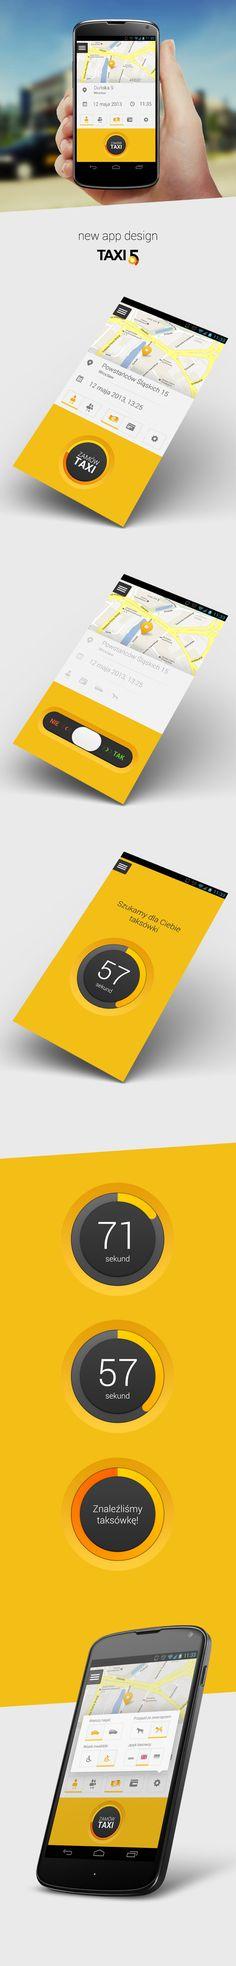 App Design for TAXI5